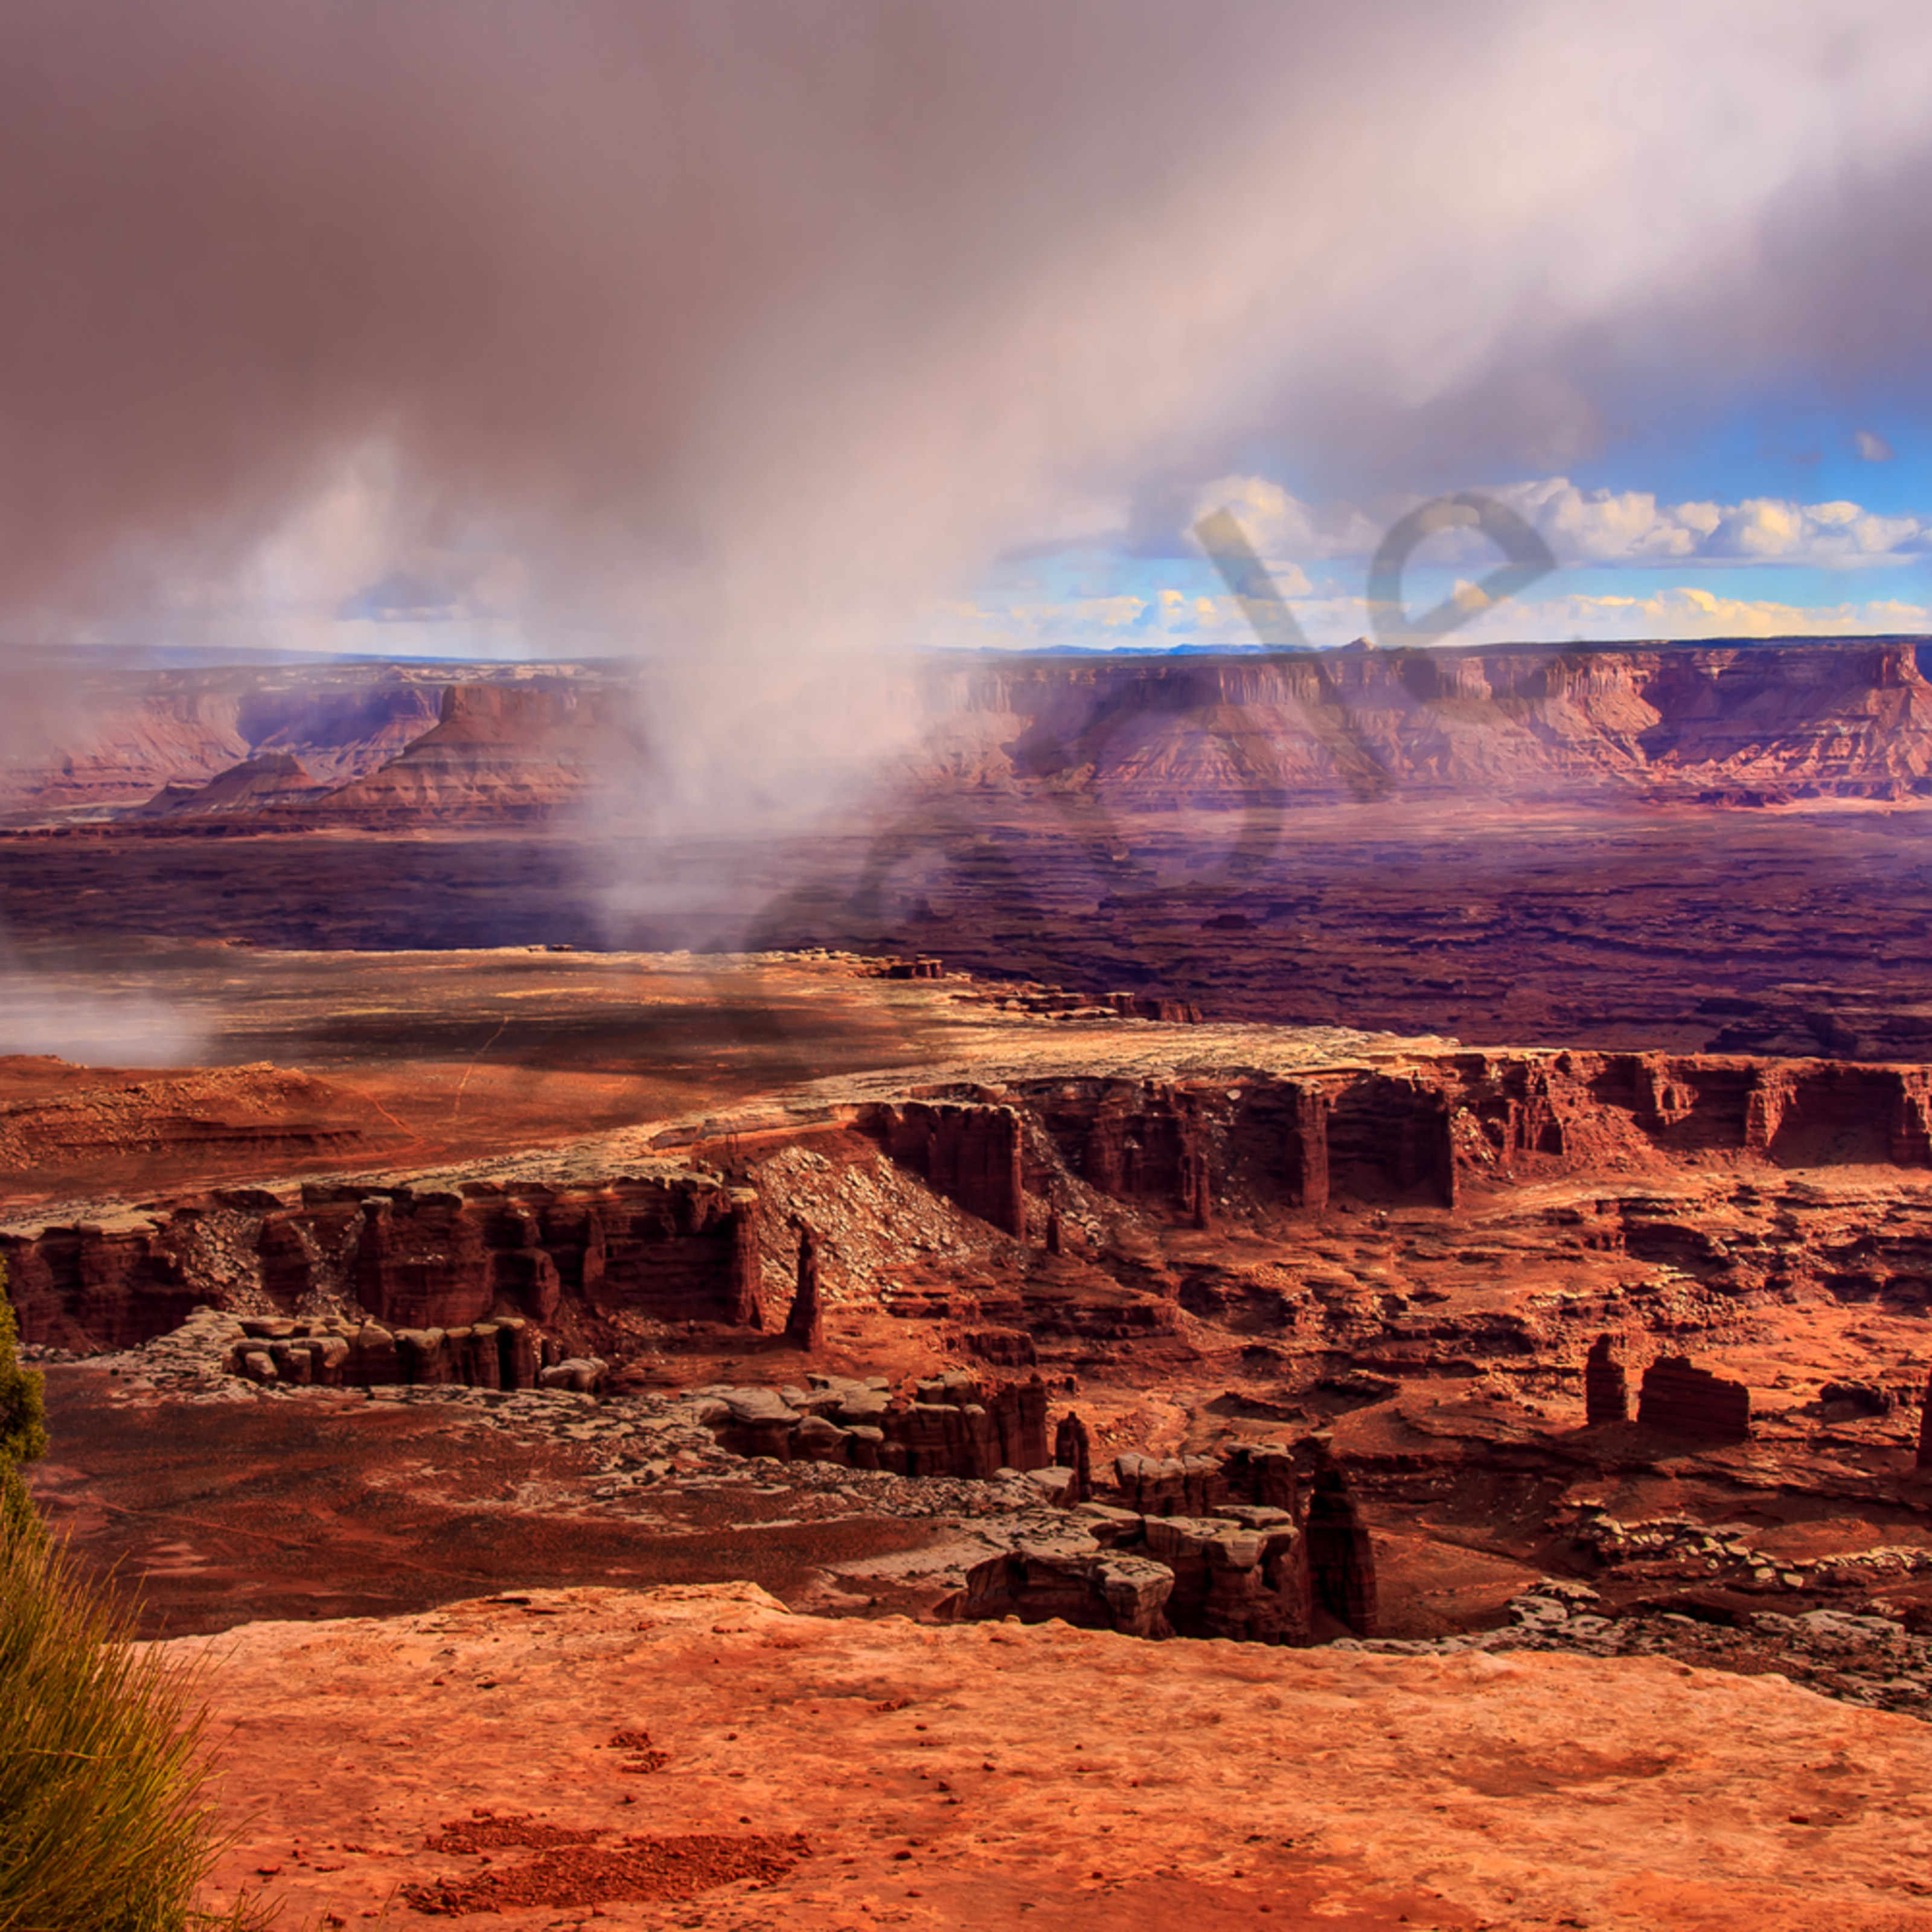 Rainburst over canyonlands imzxip